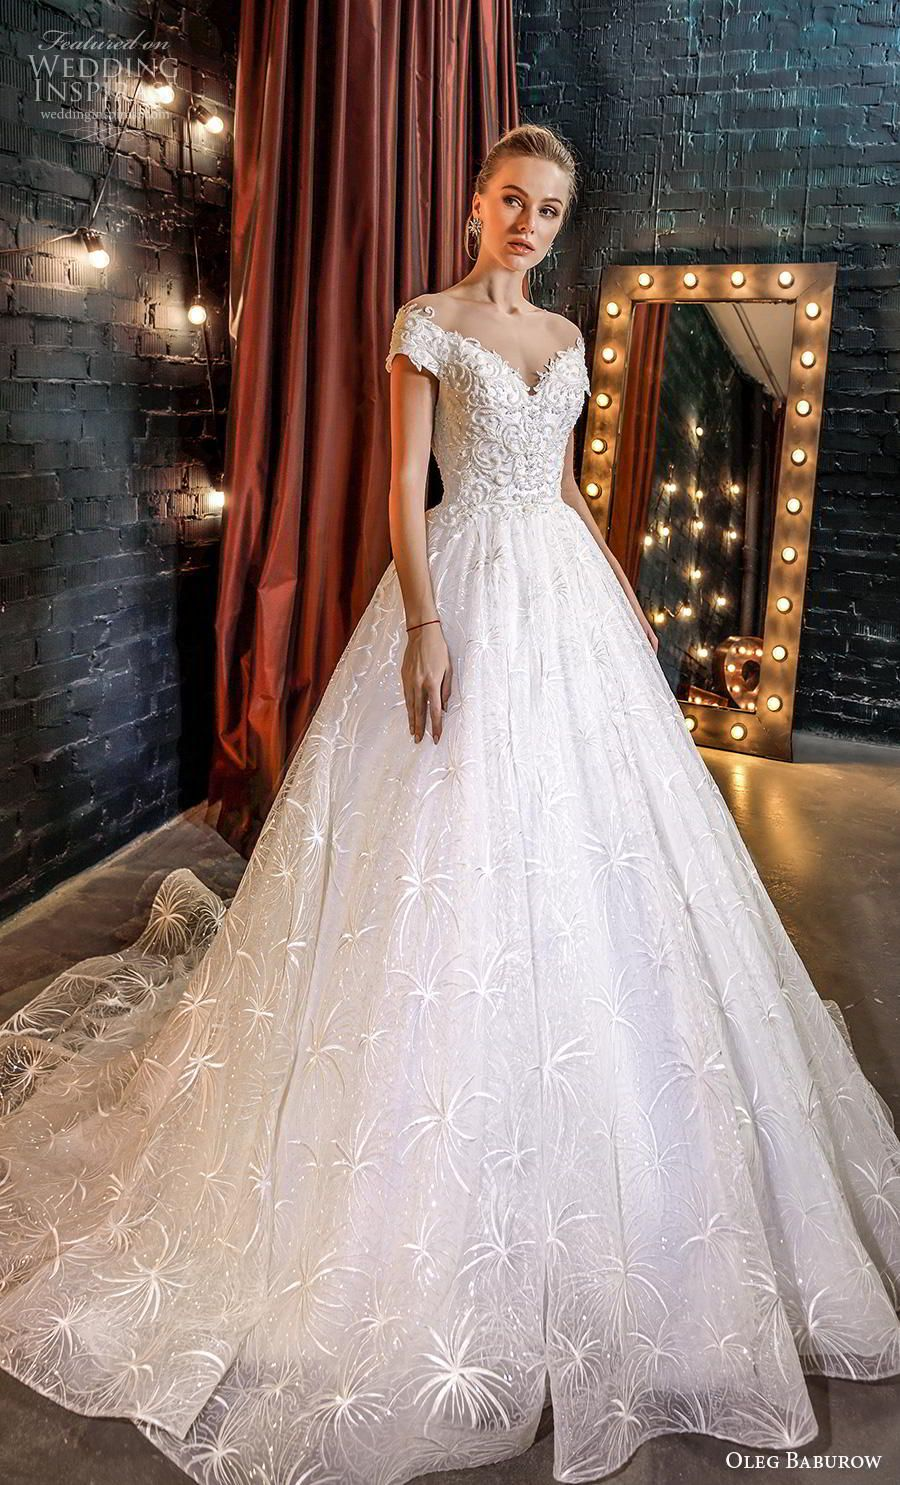 Oleg Baburow 2020 'Star Girl' Wedding Dresses * Latest